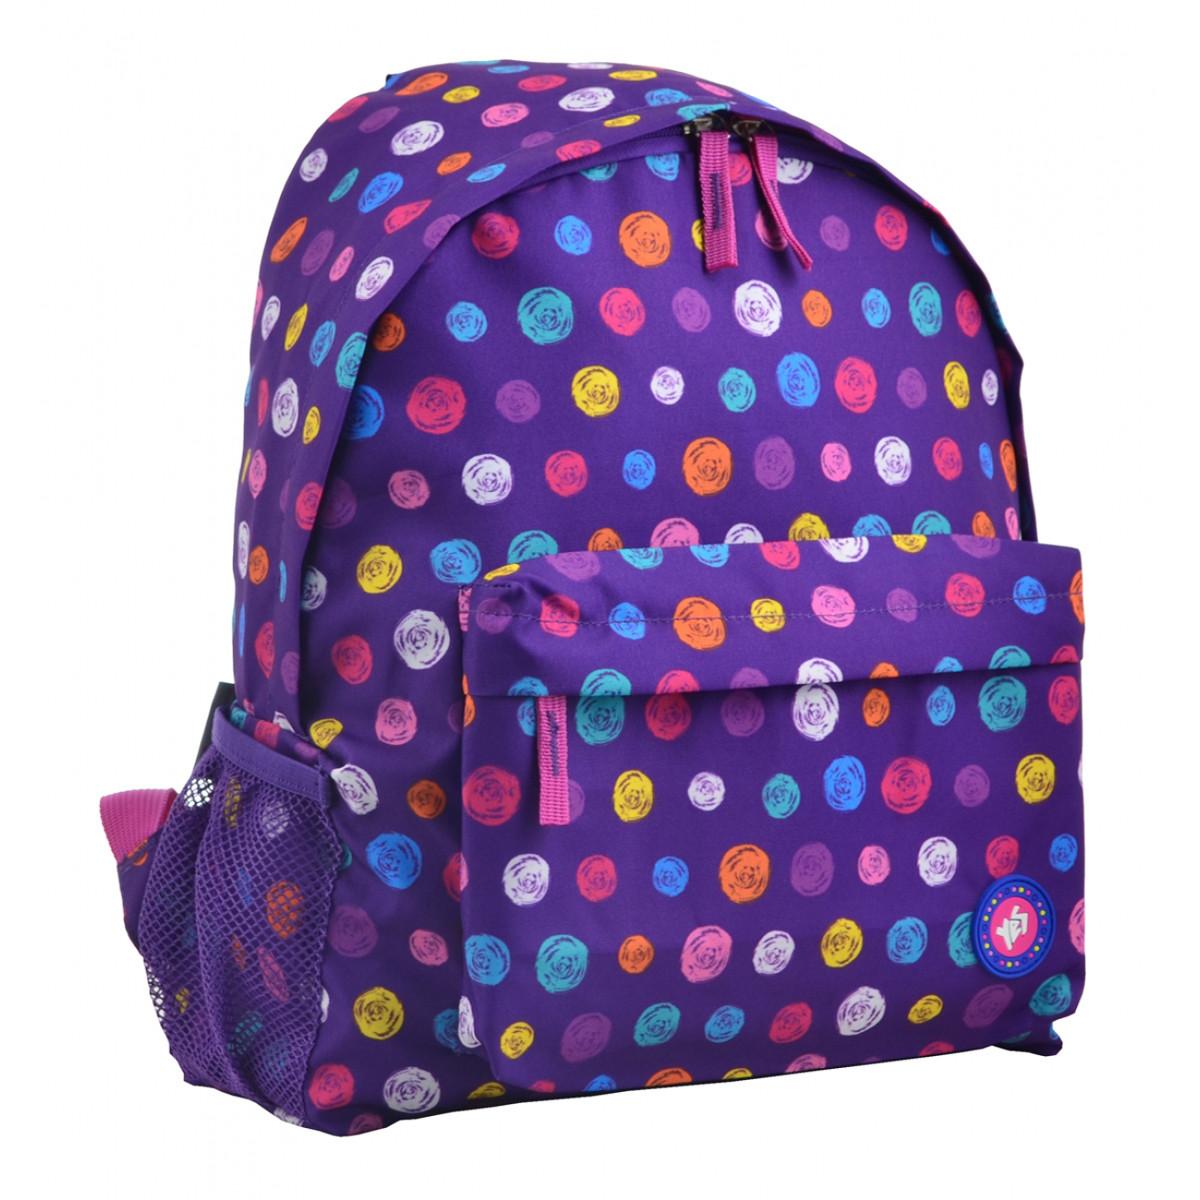 Рюкзак молодежный YES ST-33 Pumpy, 35*29*12 555495